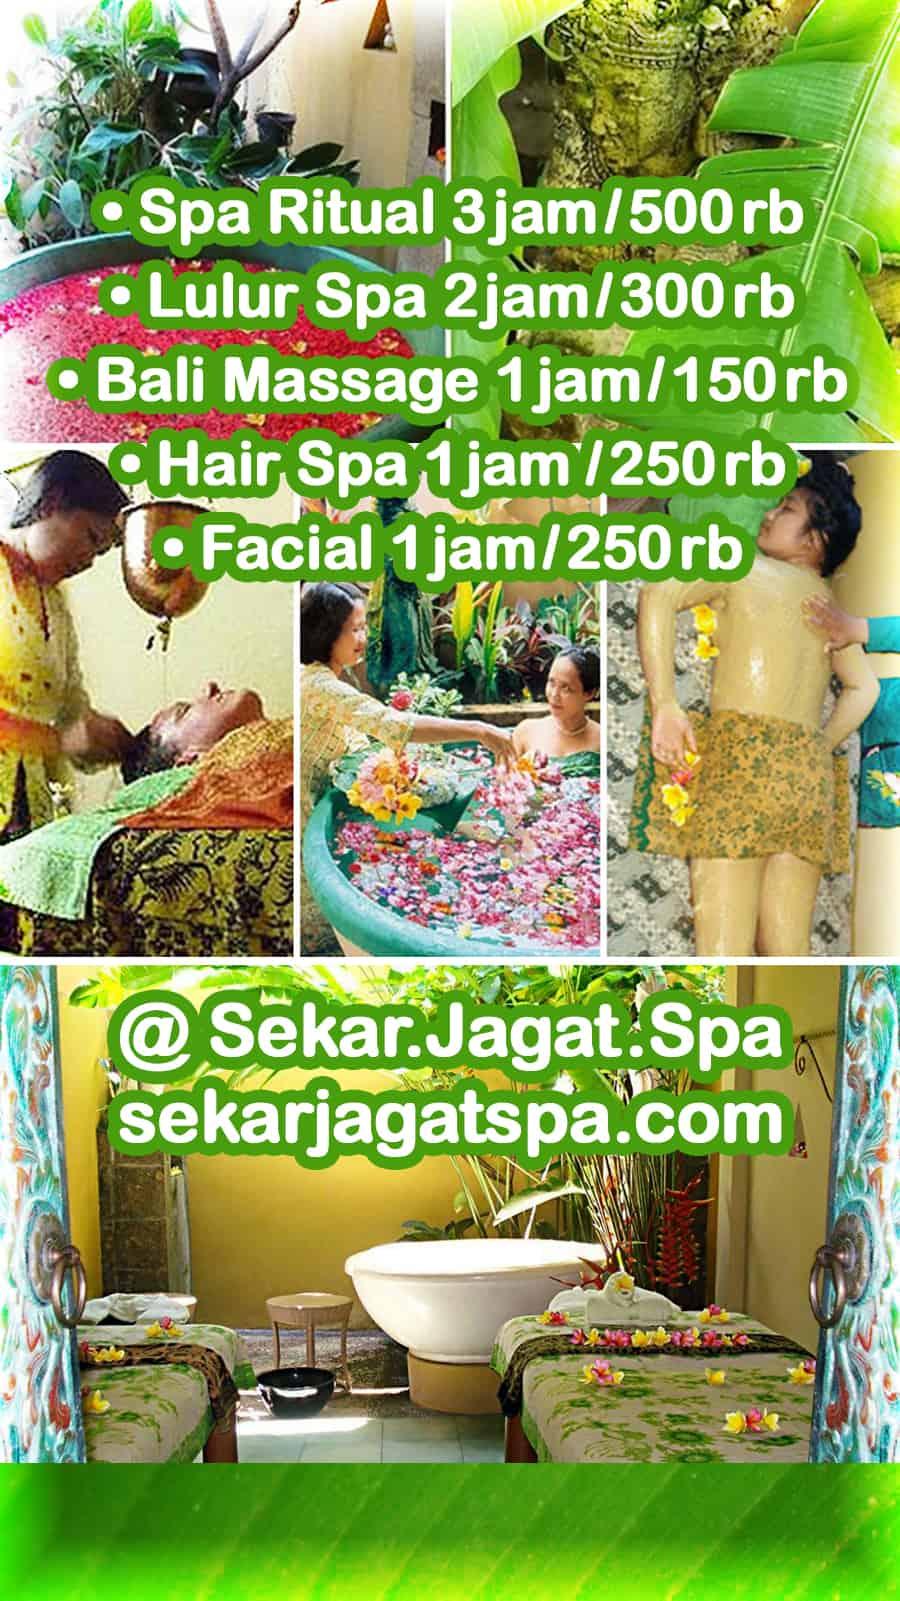 Bali Spa Promo